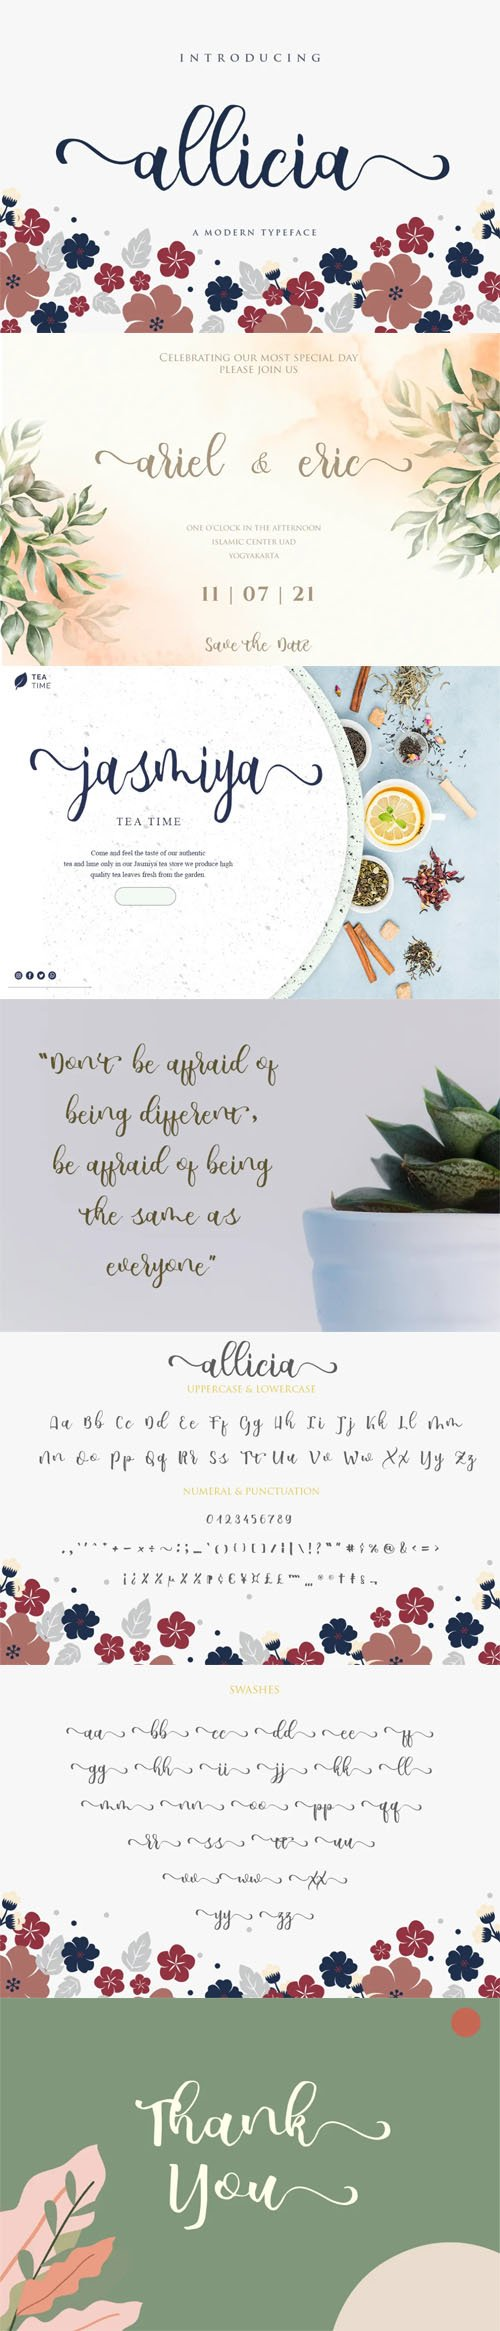 allicia Script - Stylish Feminine Typeface